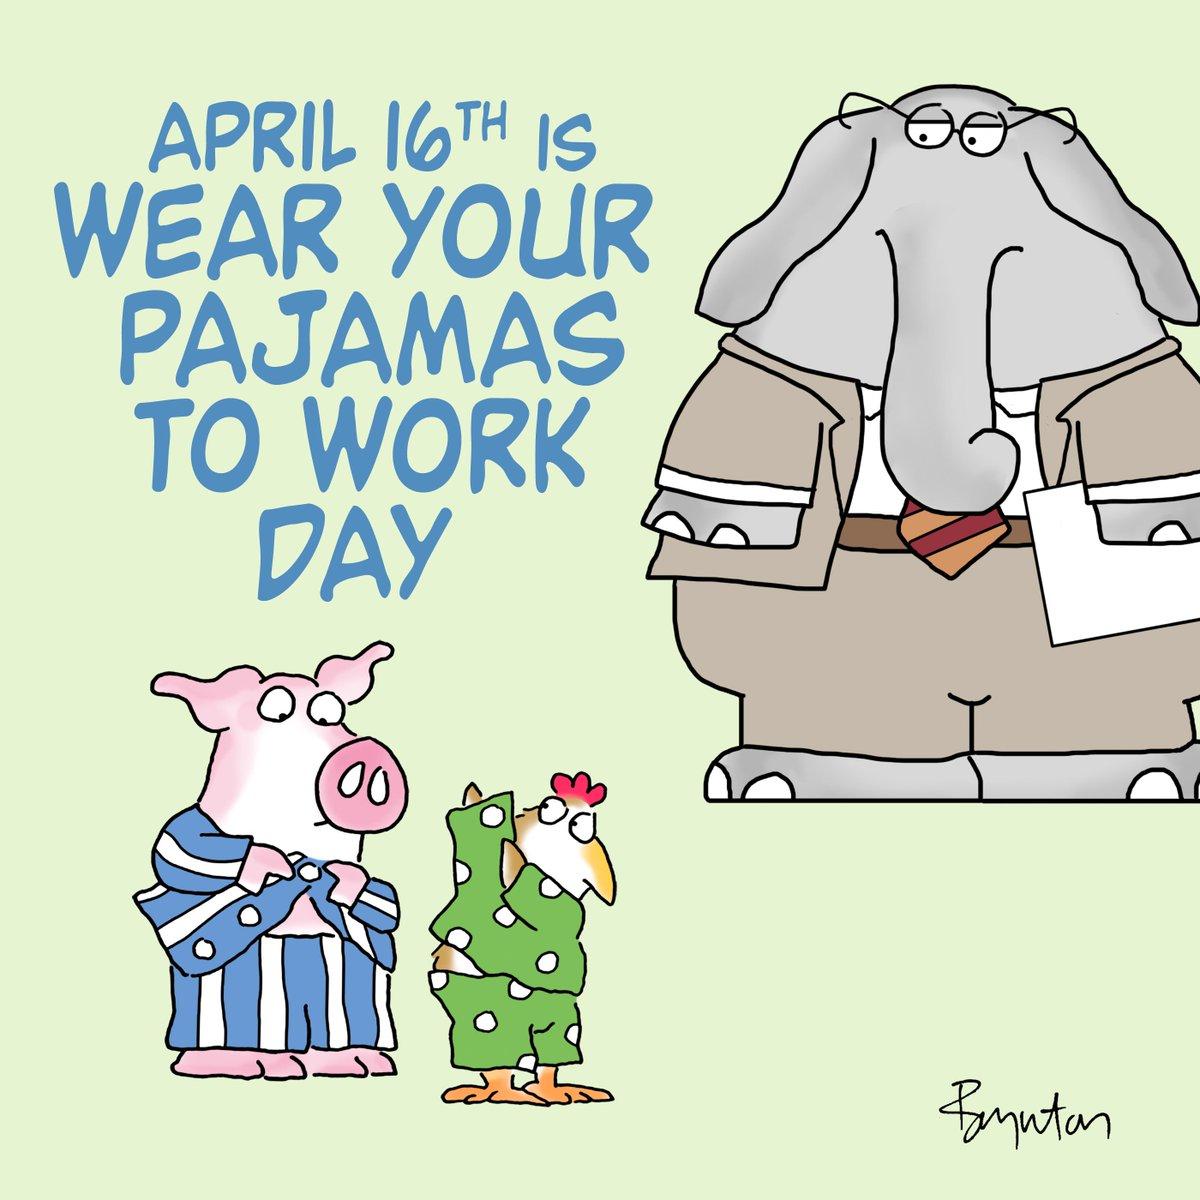 Important Public Service Announcement. #WearYourPajamasToWorkDay #MondayMotivaton<br>http://pic.twitter.com/vQxDqxprrd